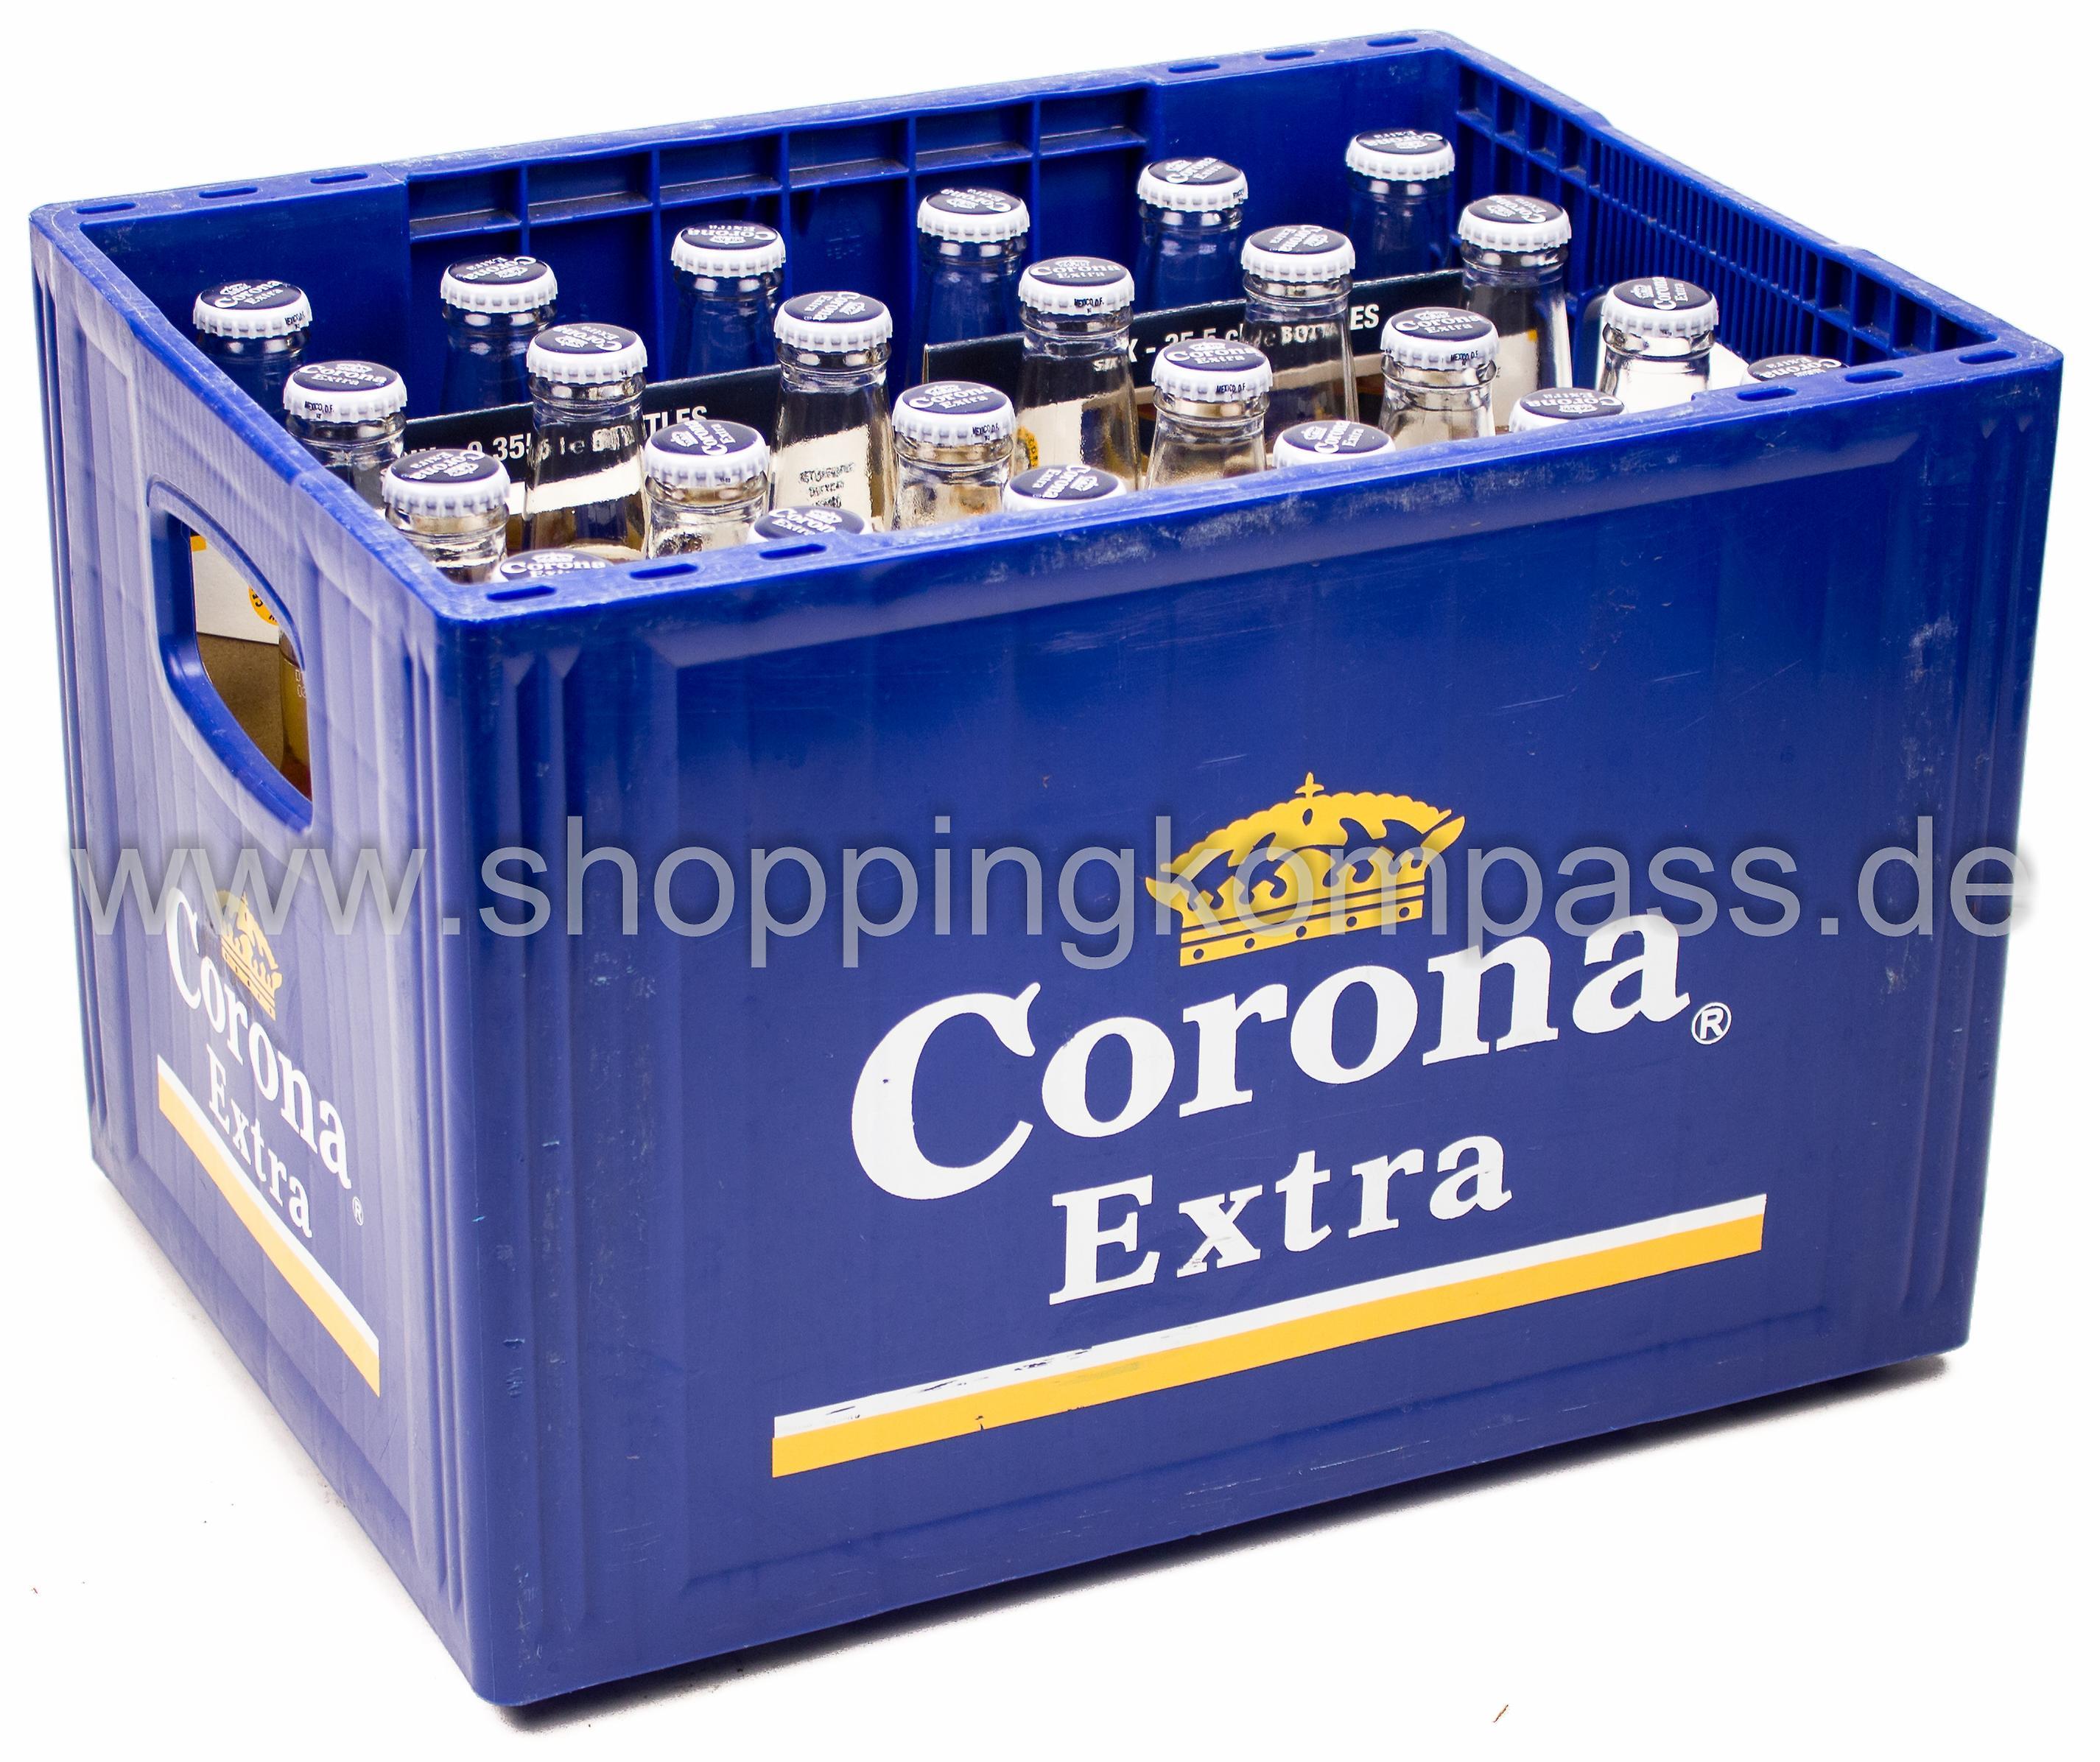 Corona Extra Kasten 4 X 6 X 0355 L Glas Mehrweg